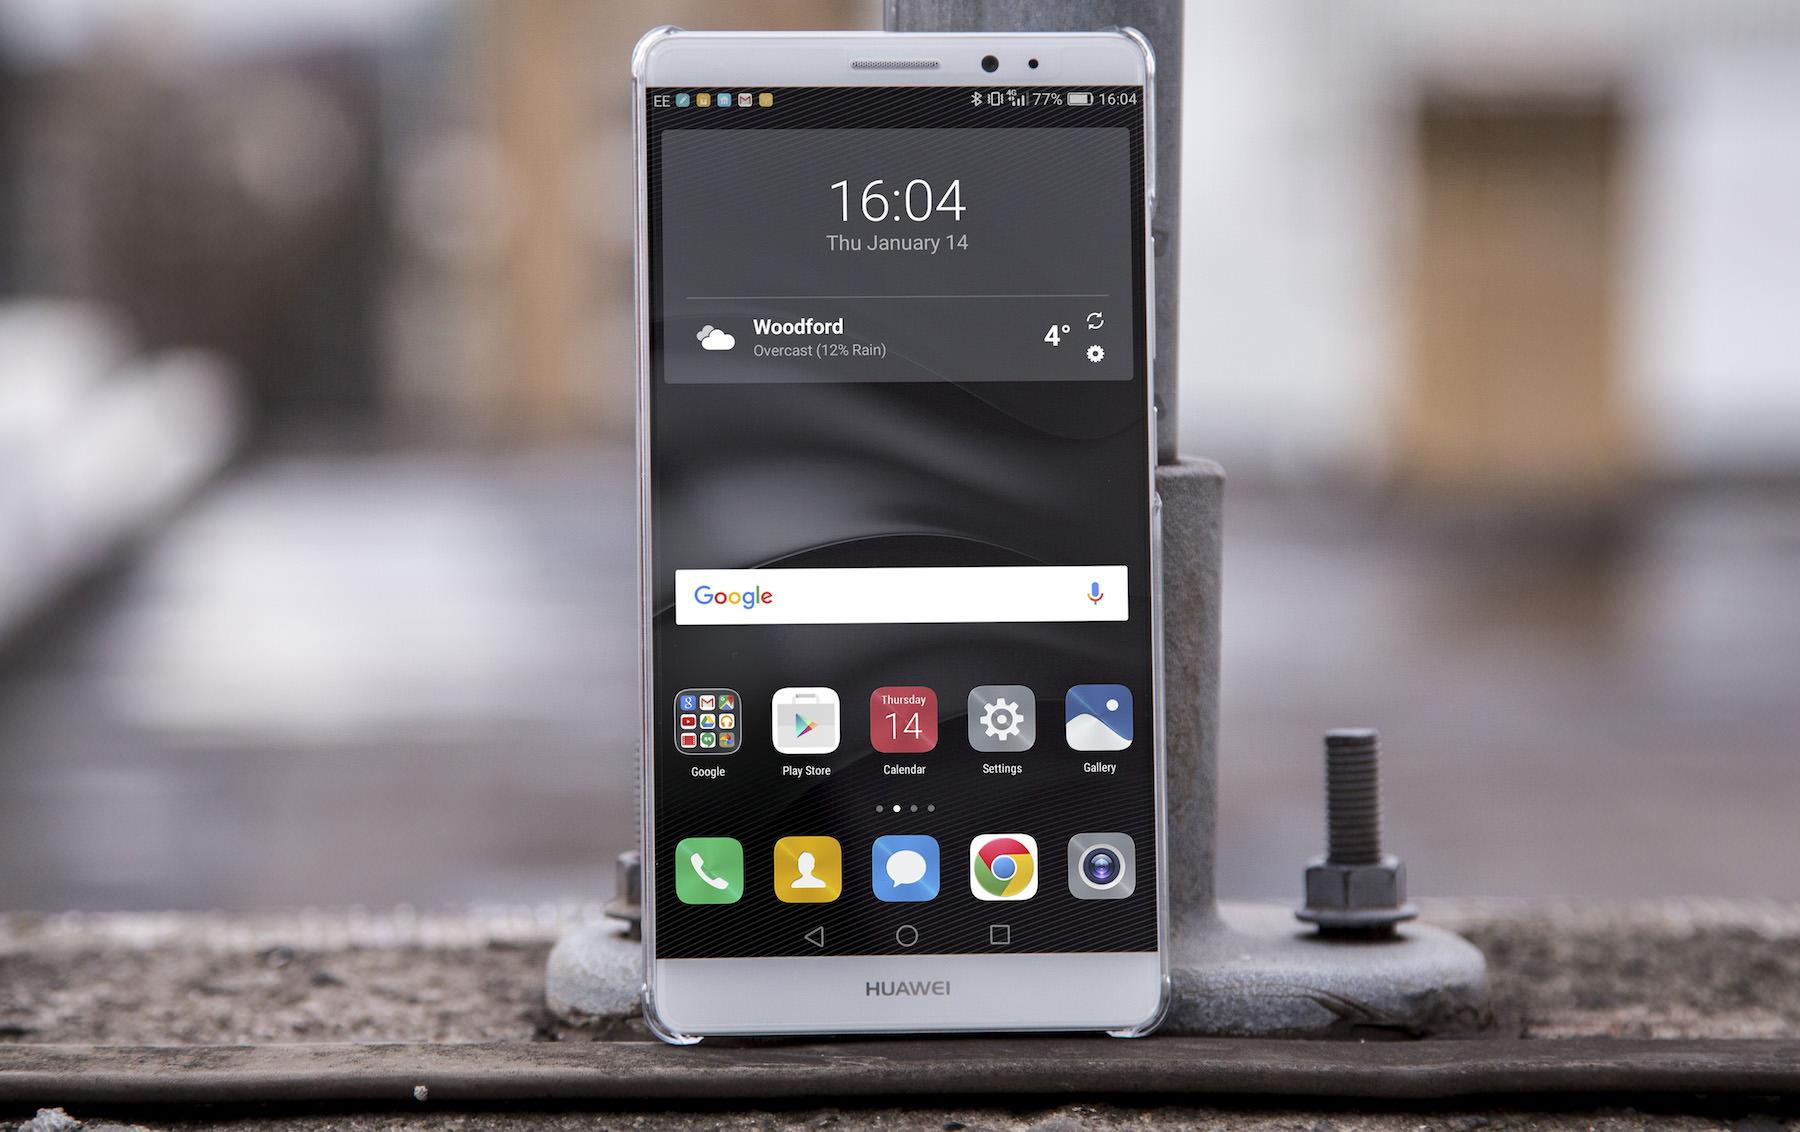 Huawei SmartPhone China 2